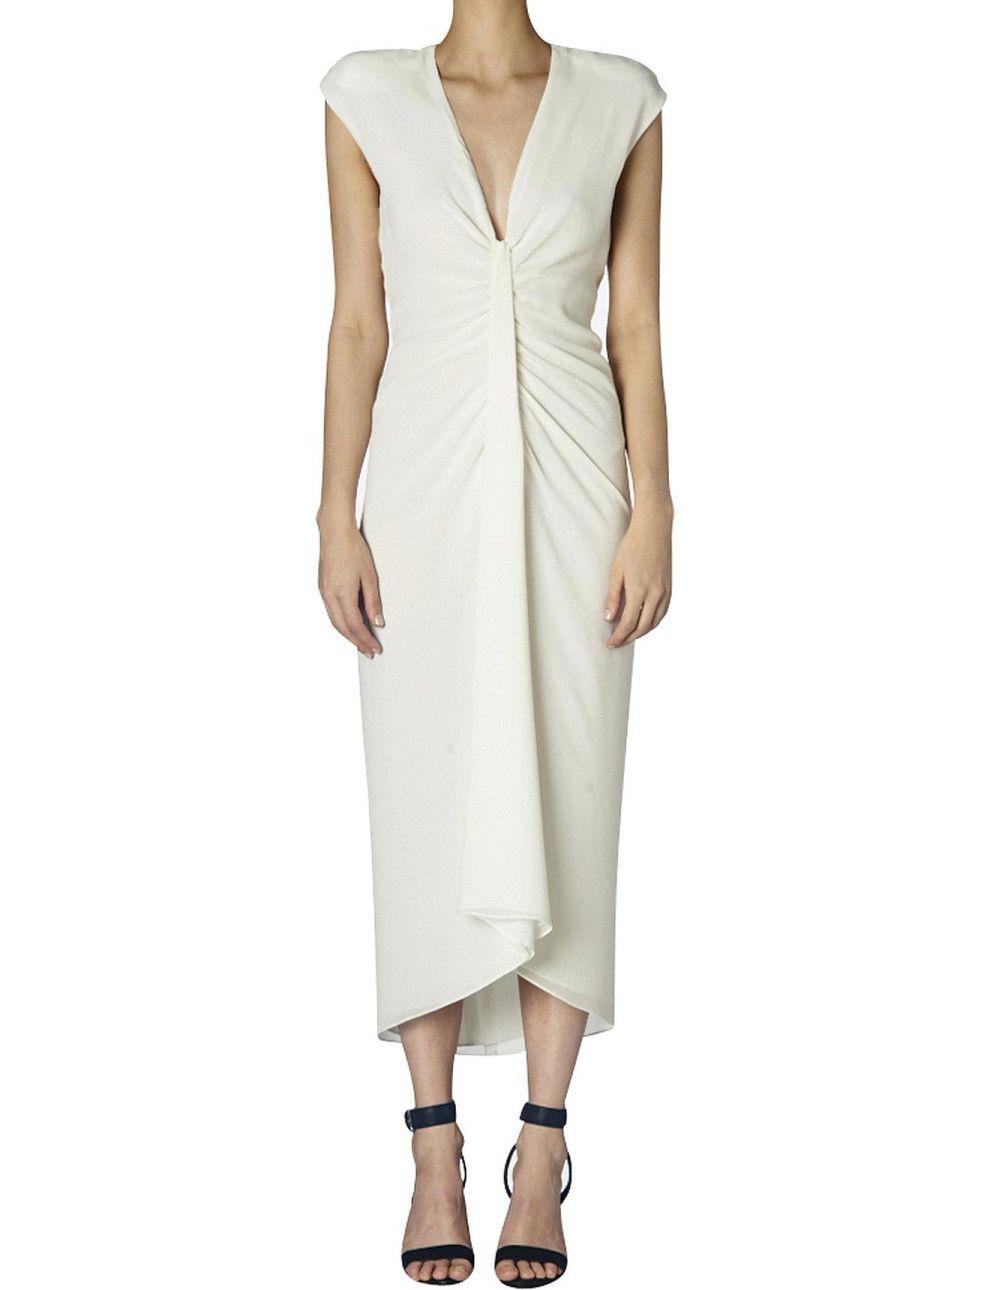 White dress david jones - Cream Crepe Giselle Rouched Dress David Jones